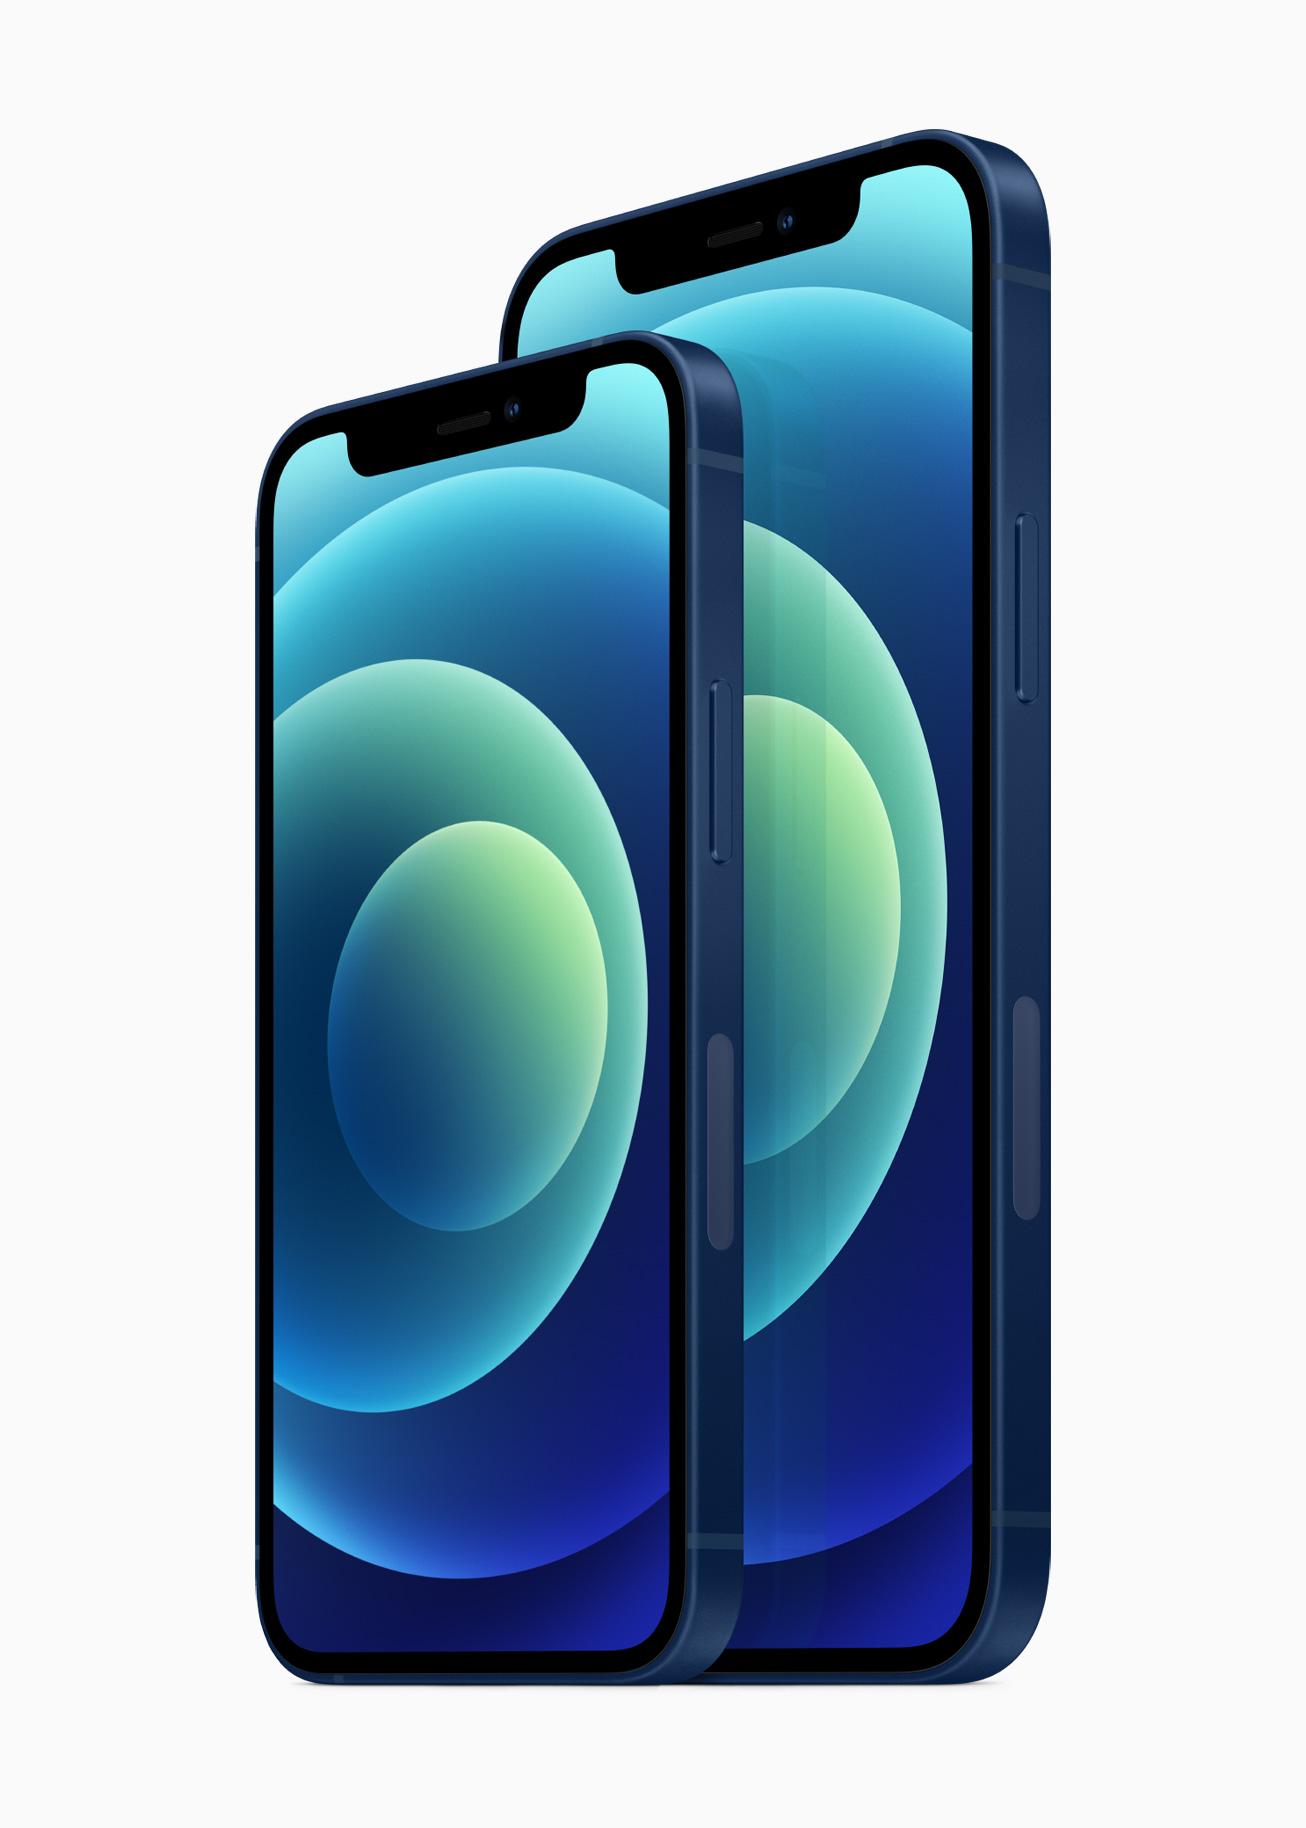 Apple компани iPhone 12, iPhone 12 Pro, iPhone 12 Pro Max, iPhone 12 mini ухаалаг утас танилцууллаа (фото 2)